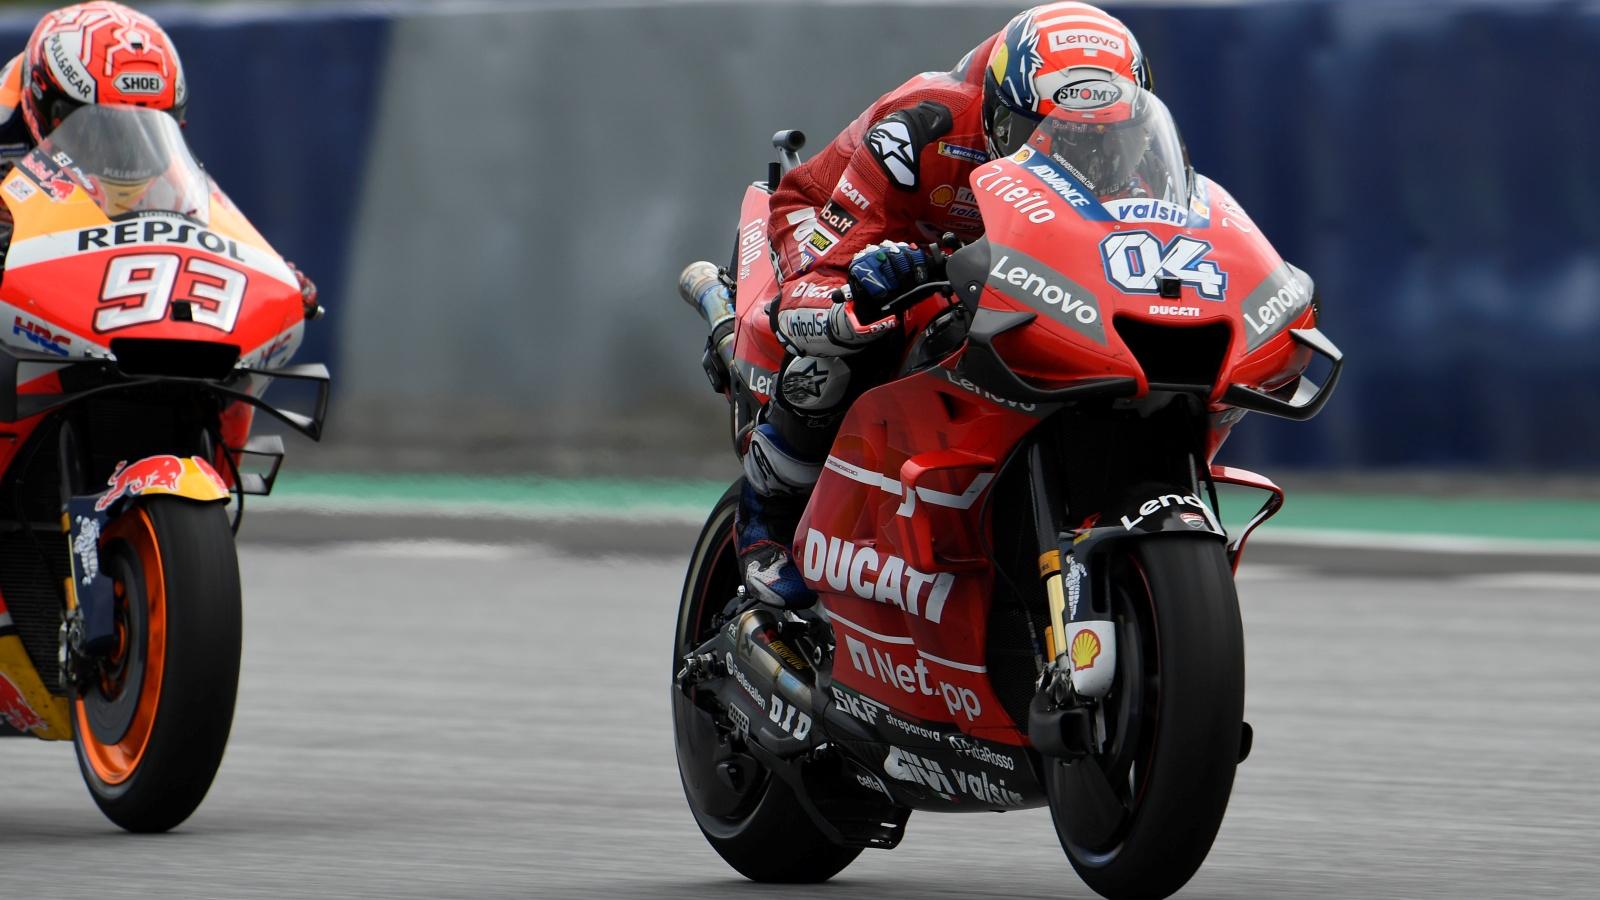 El triple estatus de Andrea Dovizioso en MotoGP